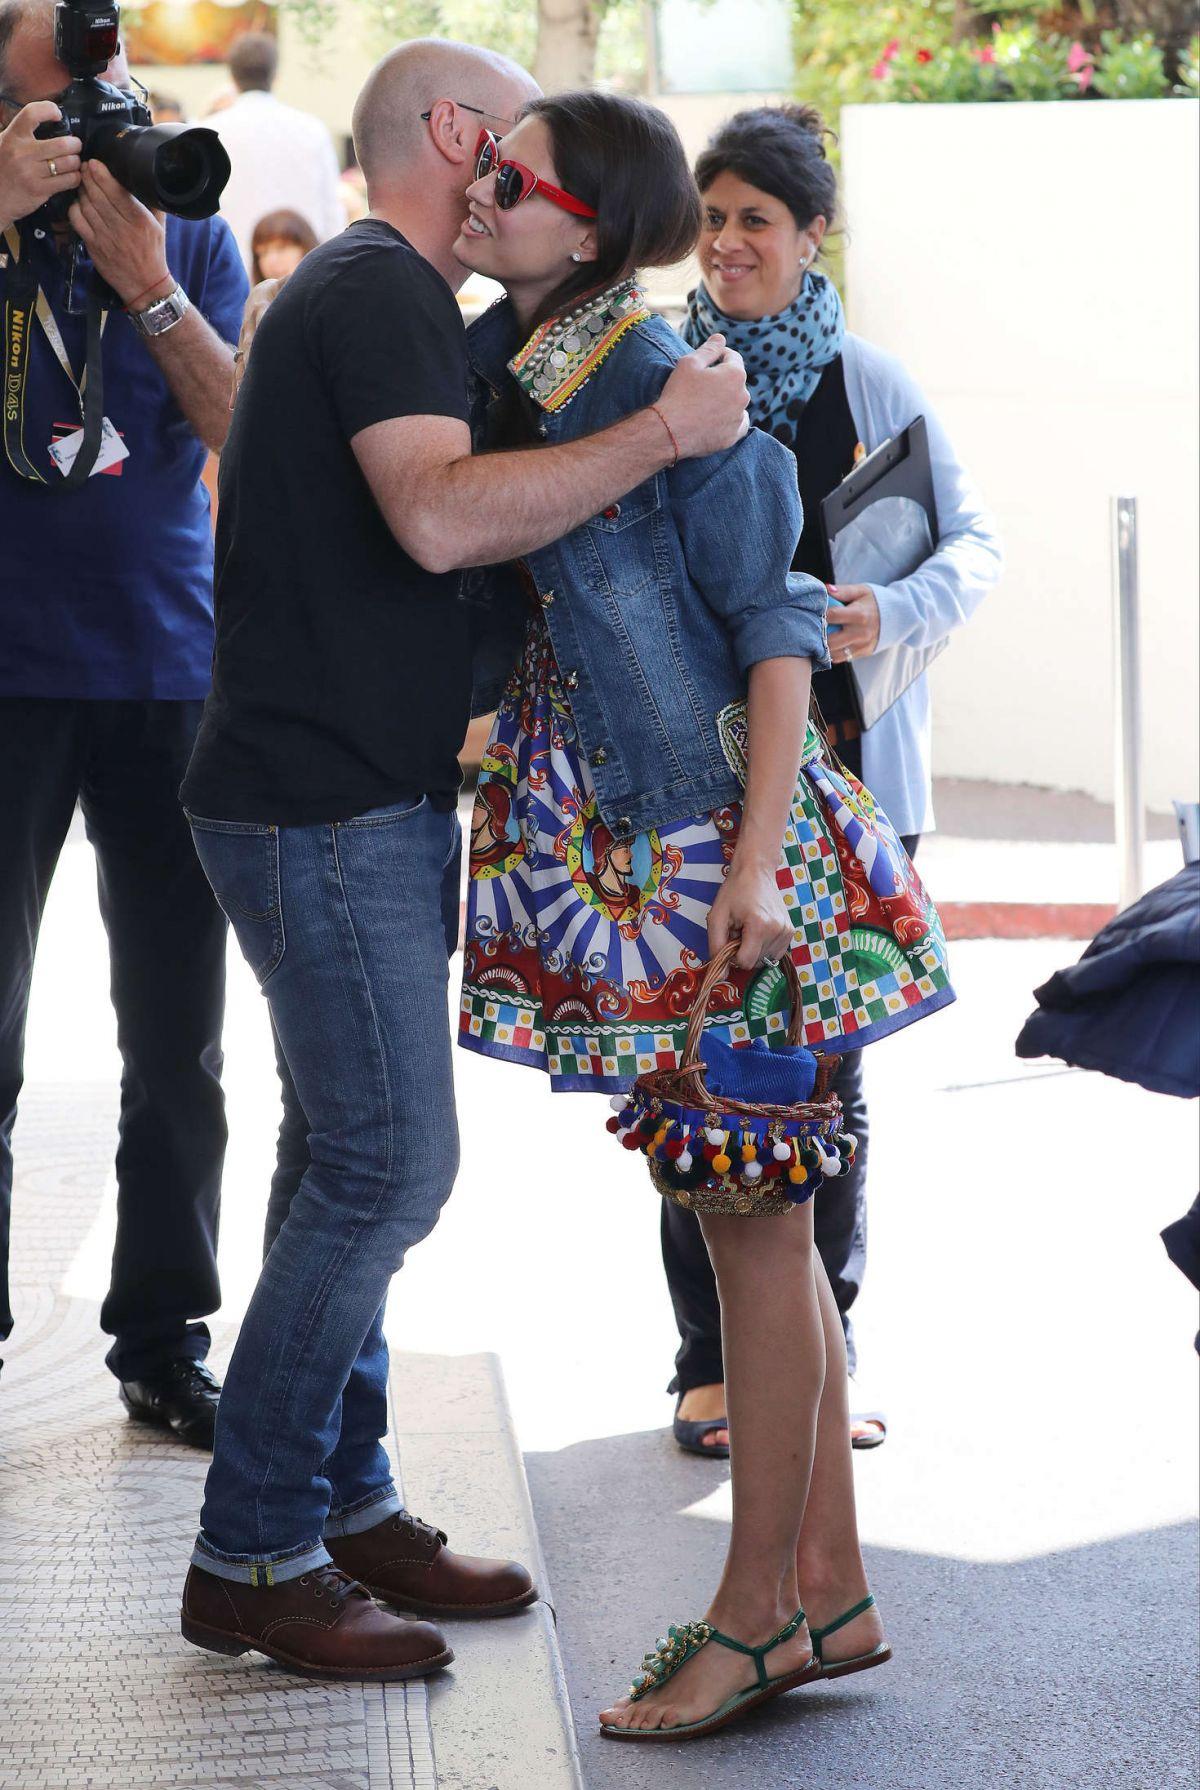 BIANCA BALTI at Martinez Hotel in Cannes 05/16/2016